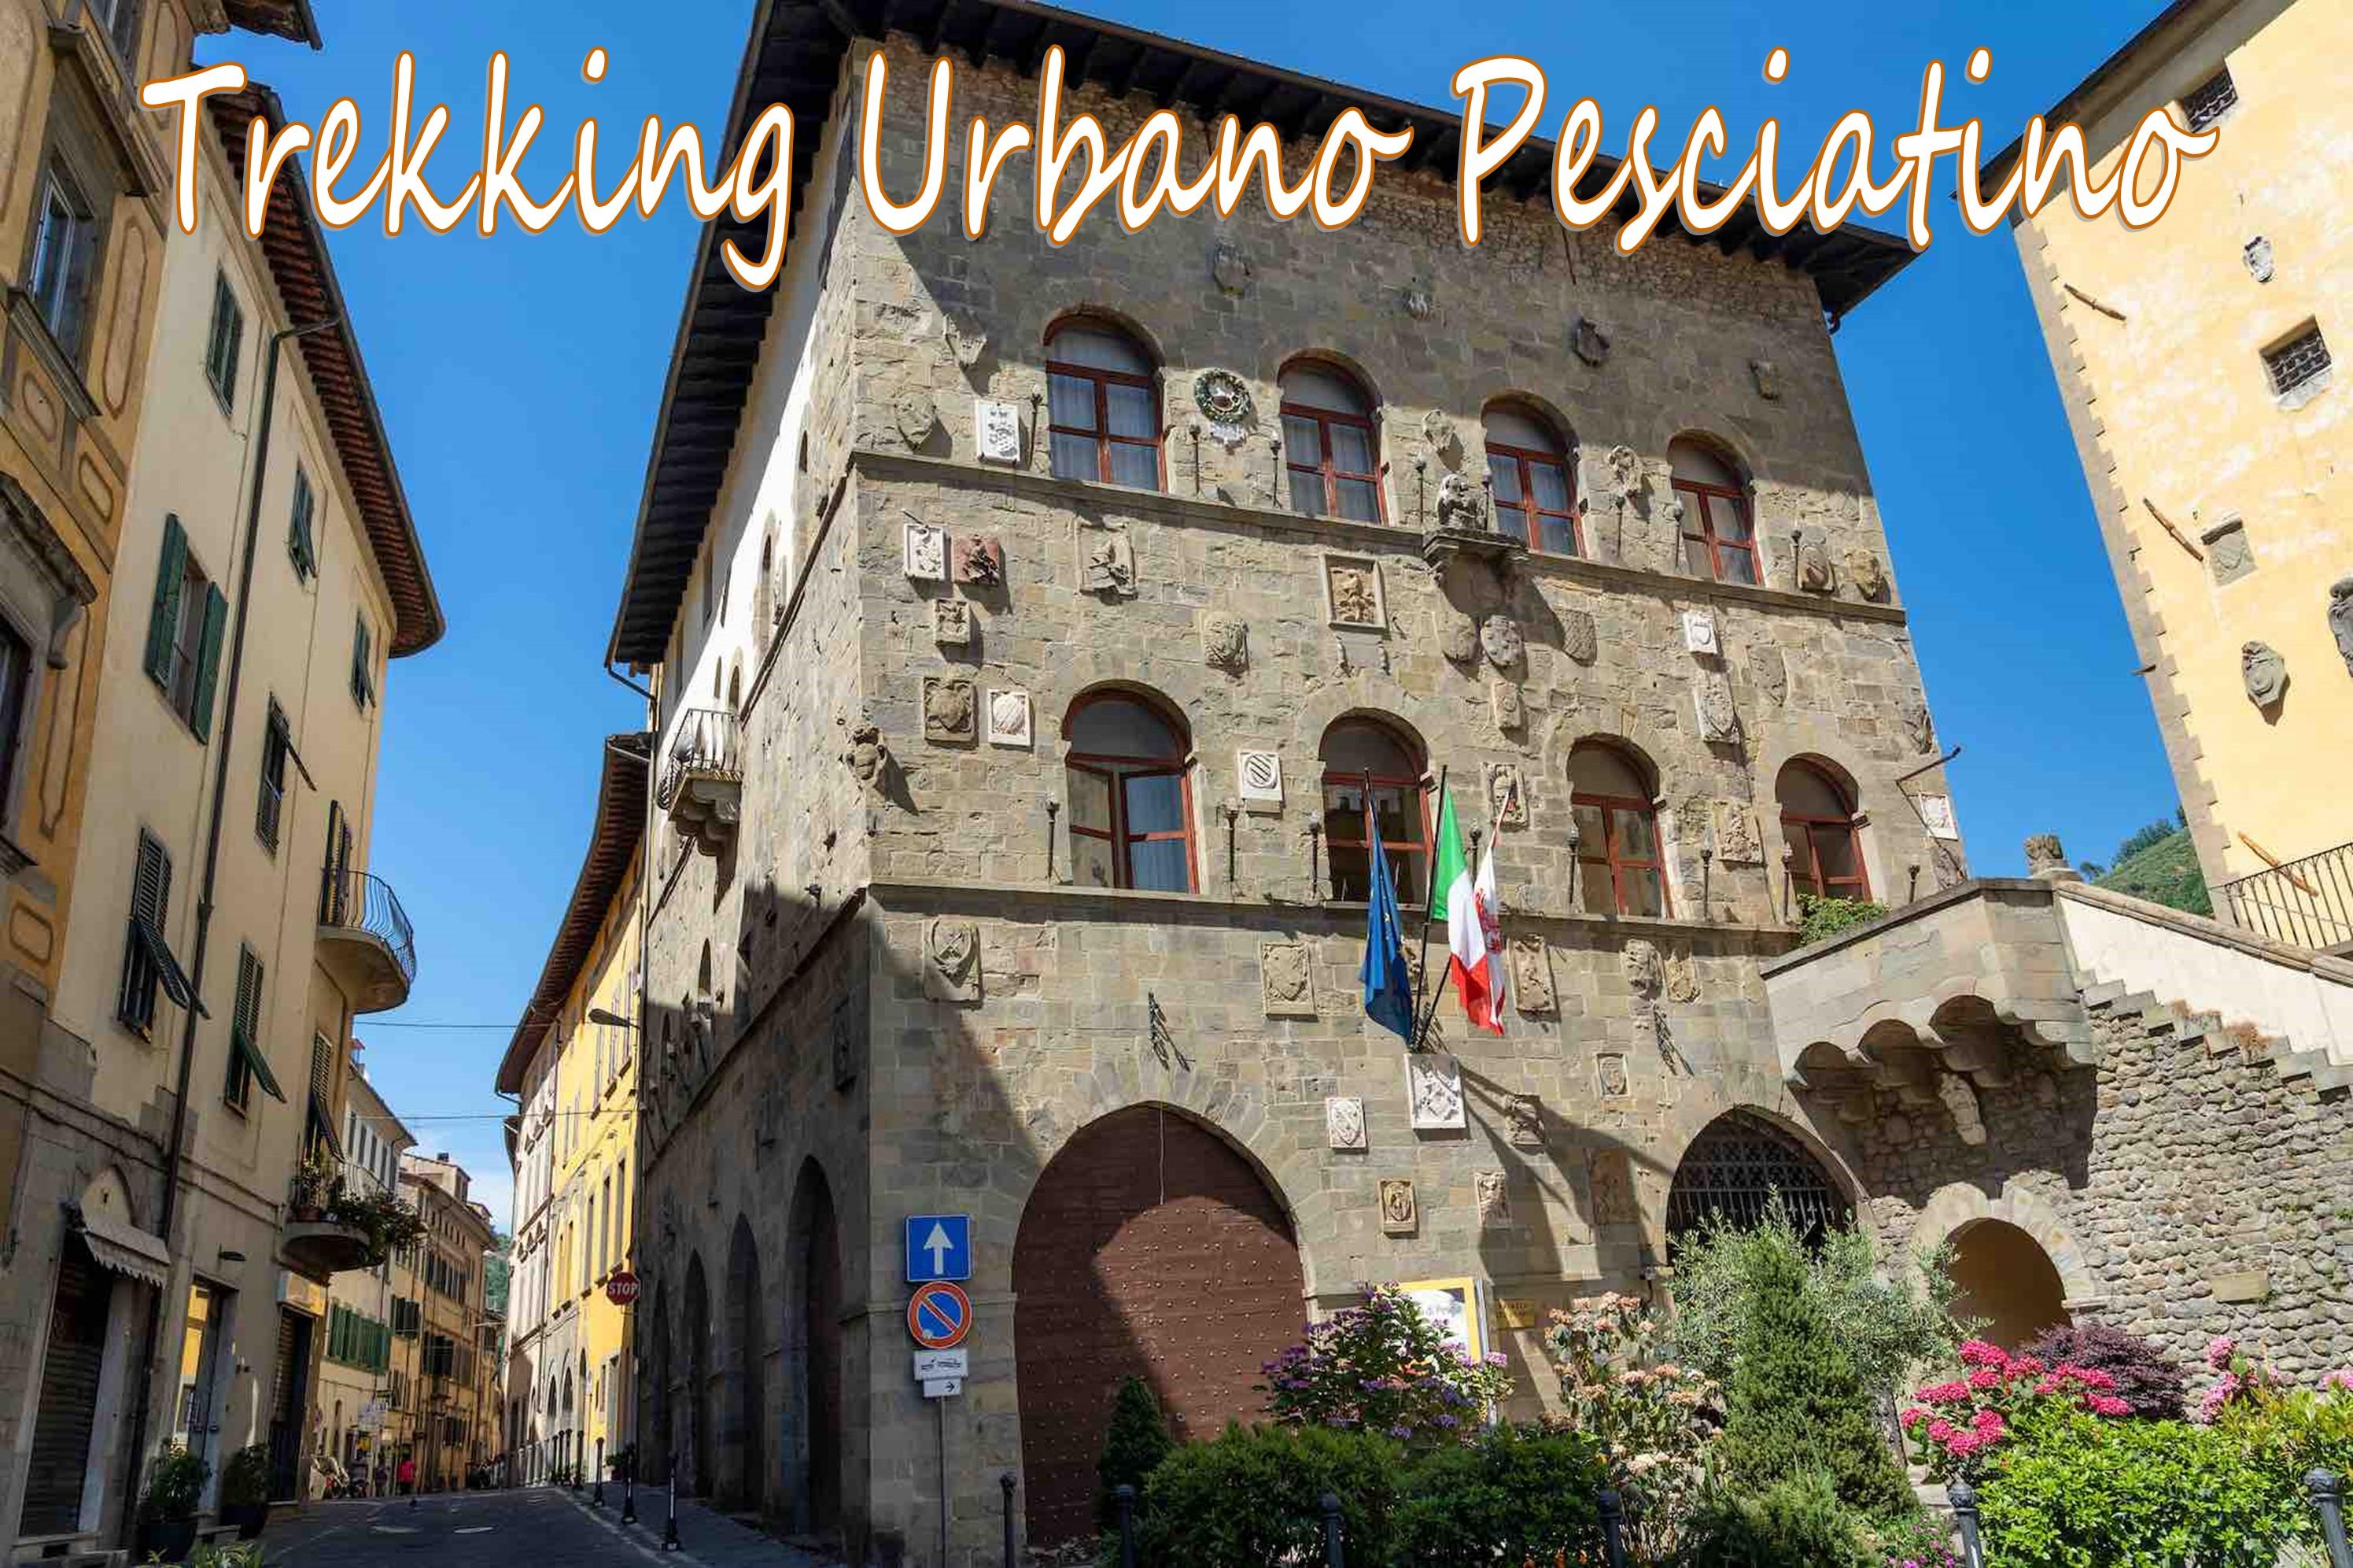 Trekking Urbano Pesciatino